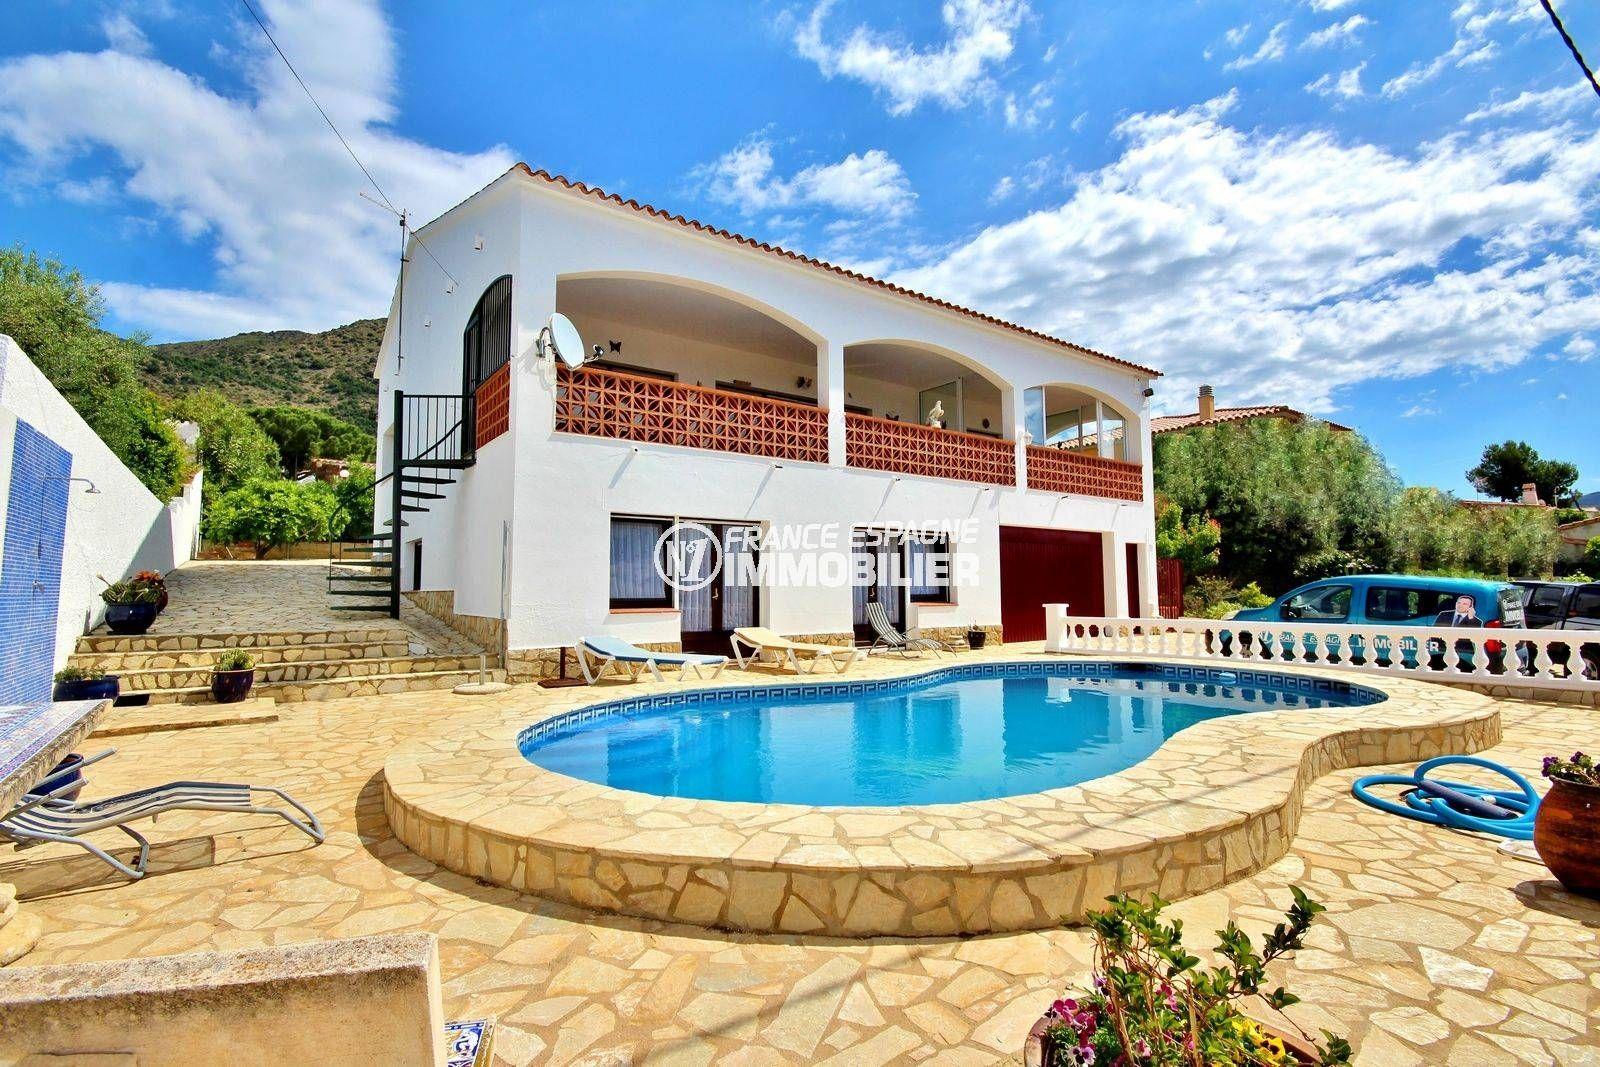 maison a vendre rosas, Mas fumats, , ref. 3702, piscine, vue mer